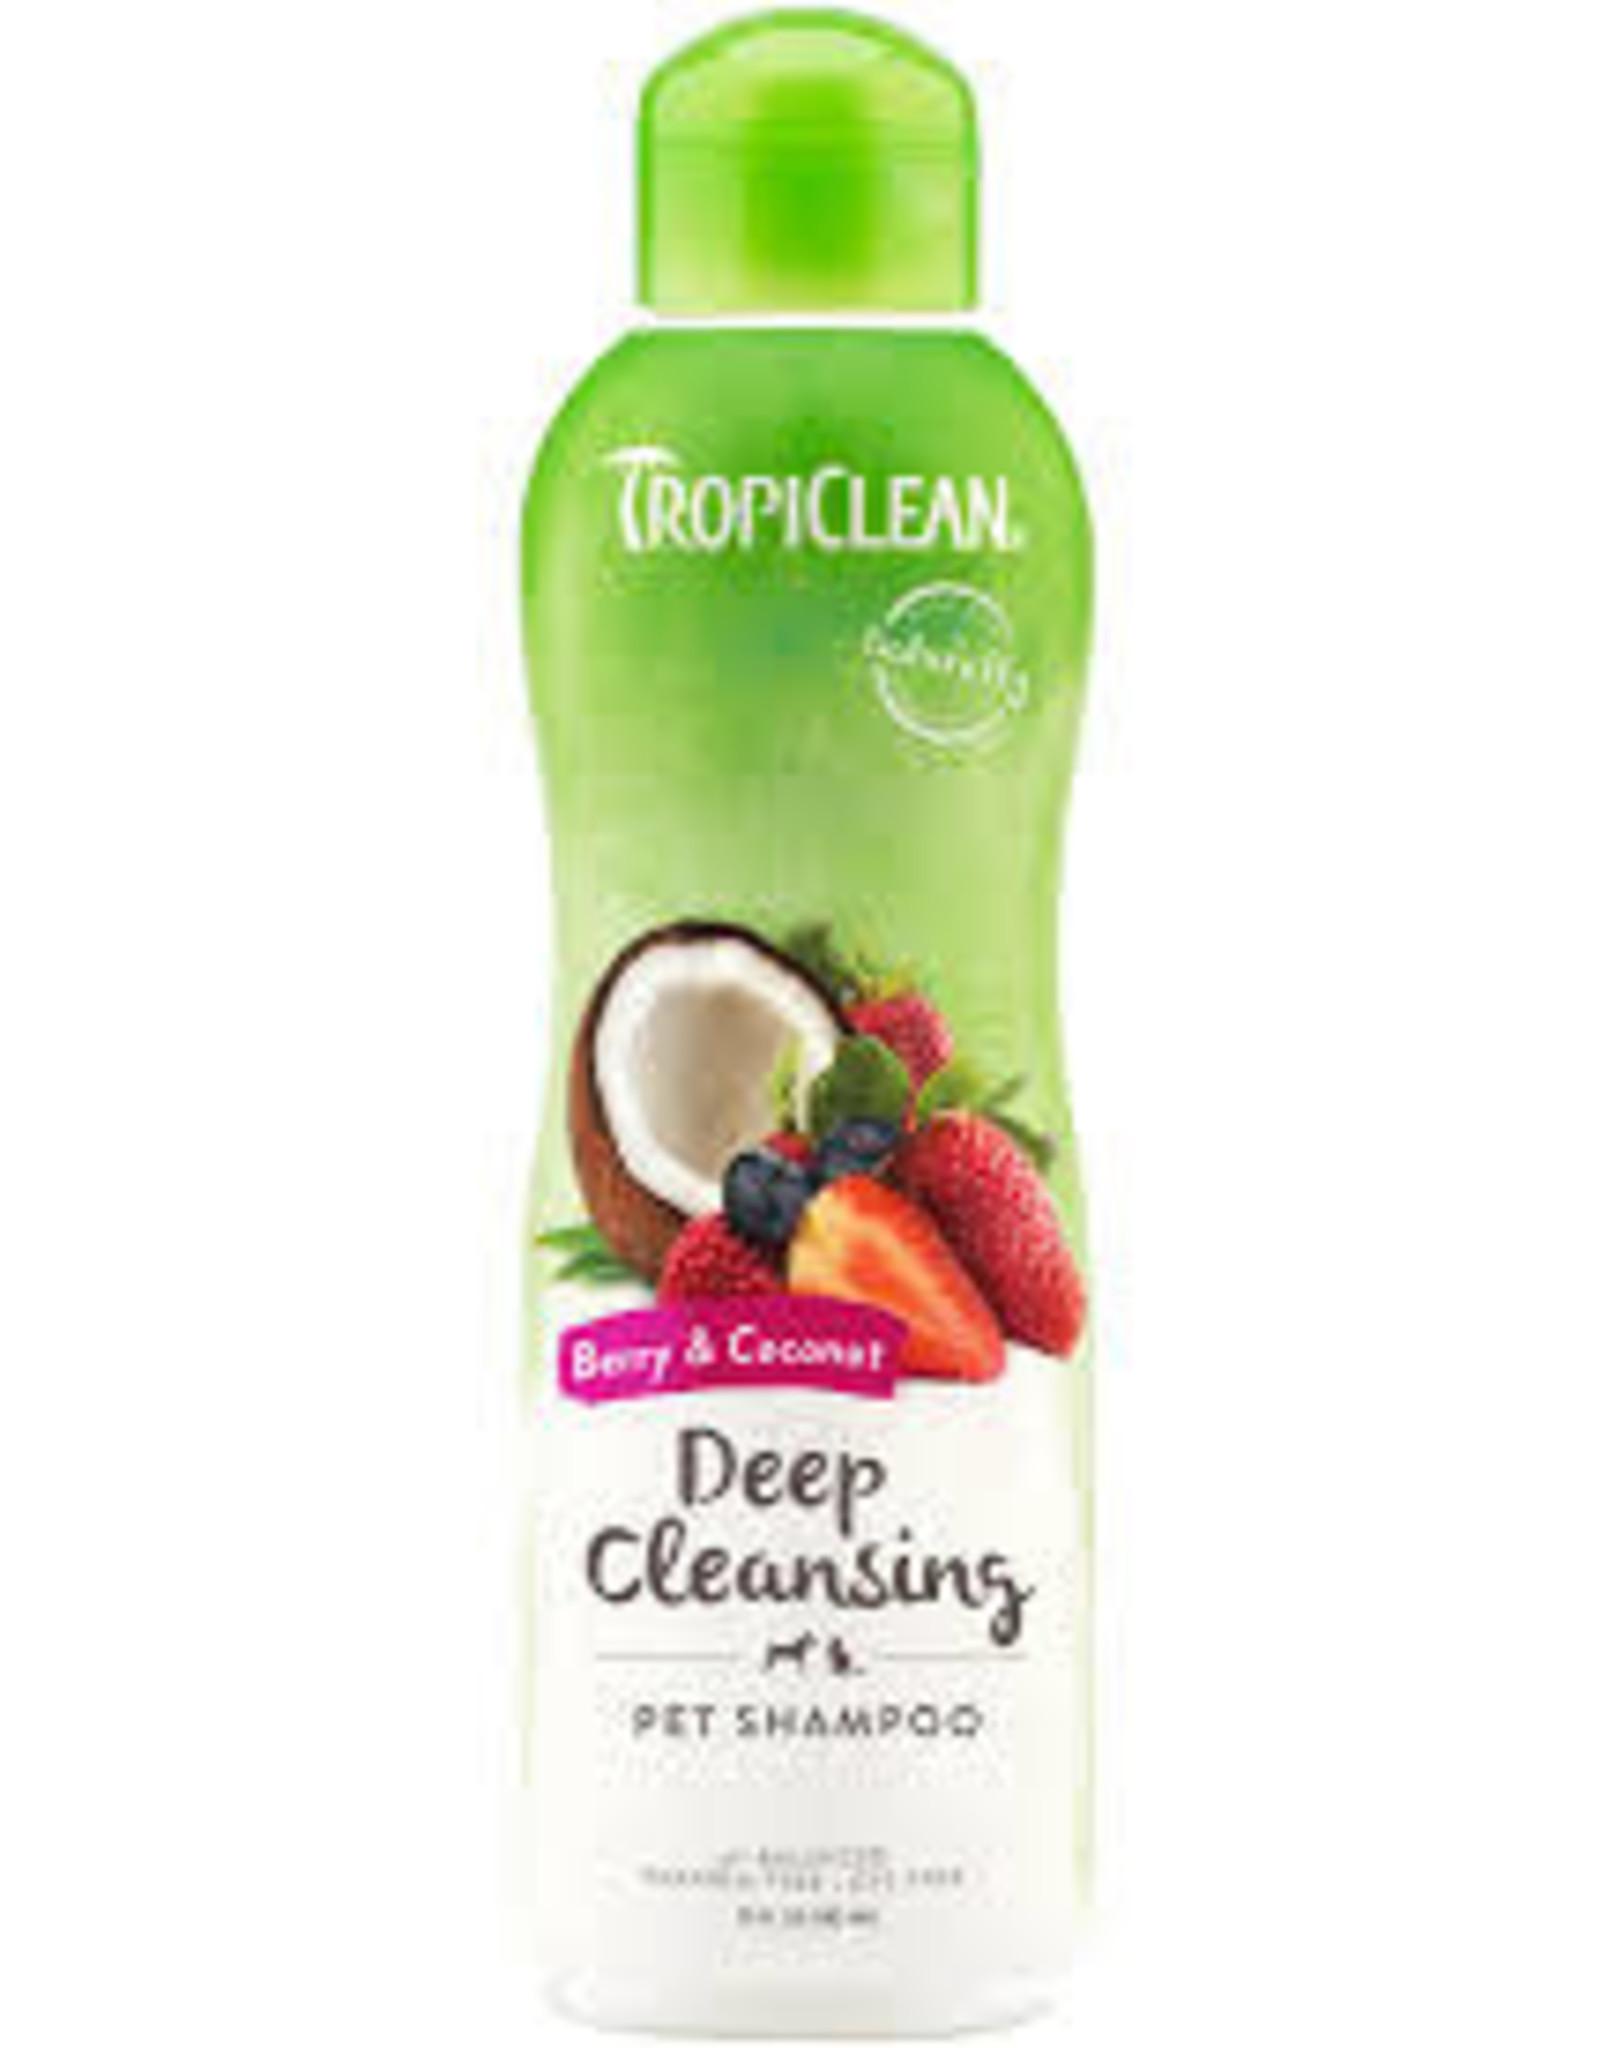 Tropiclean Tropiclean - Berry & Coconut Deep Cleansing Shampoo